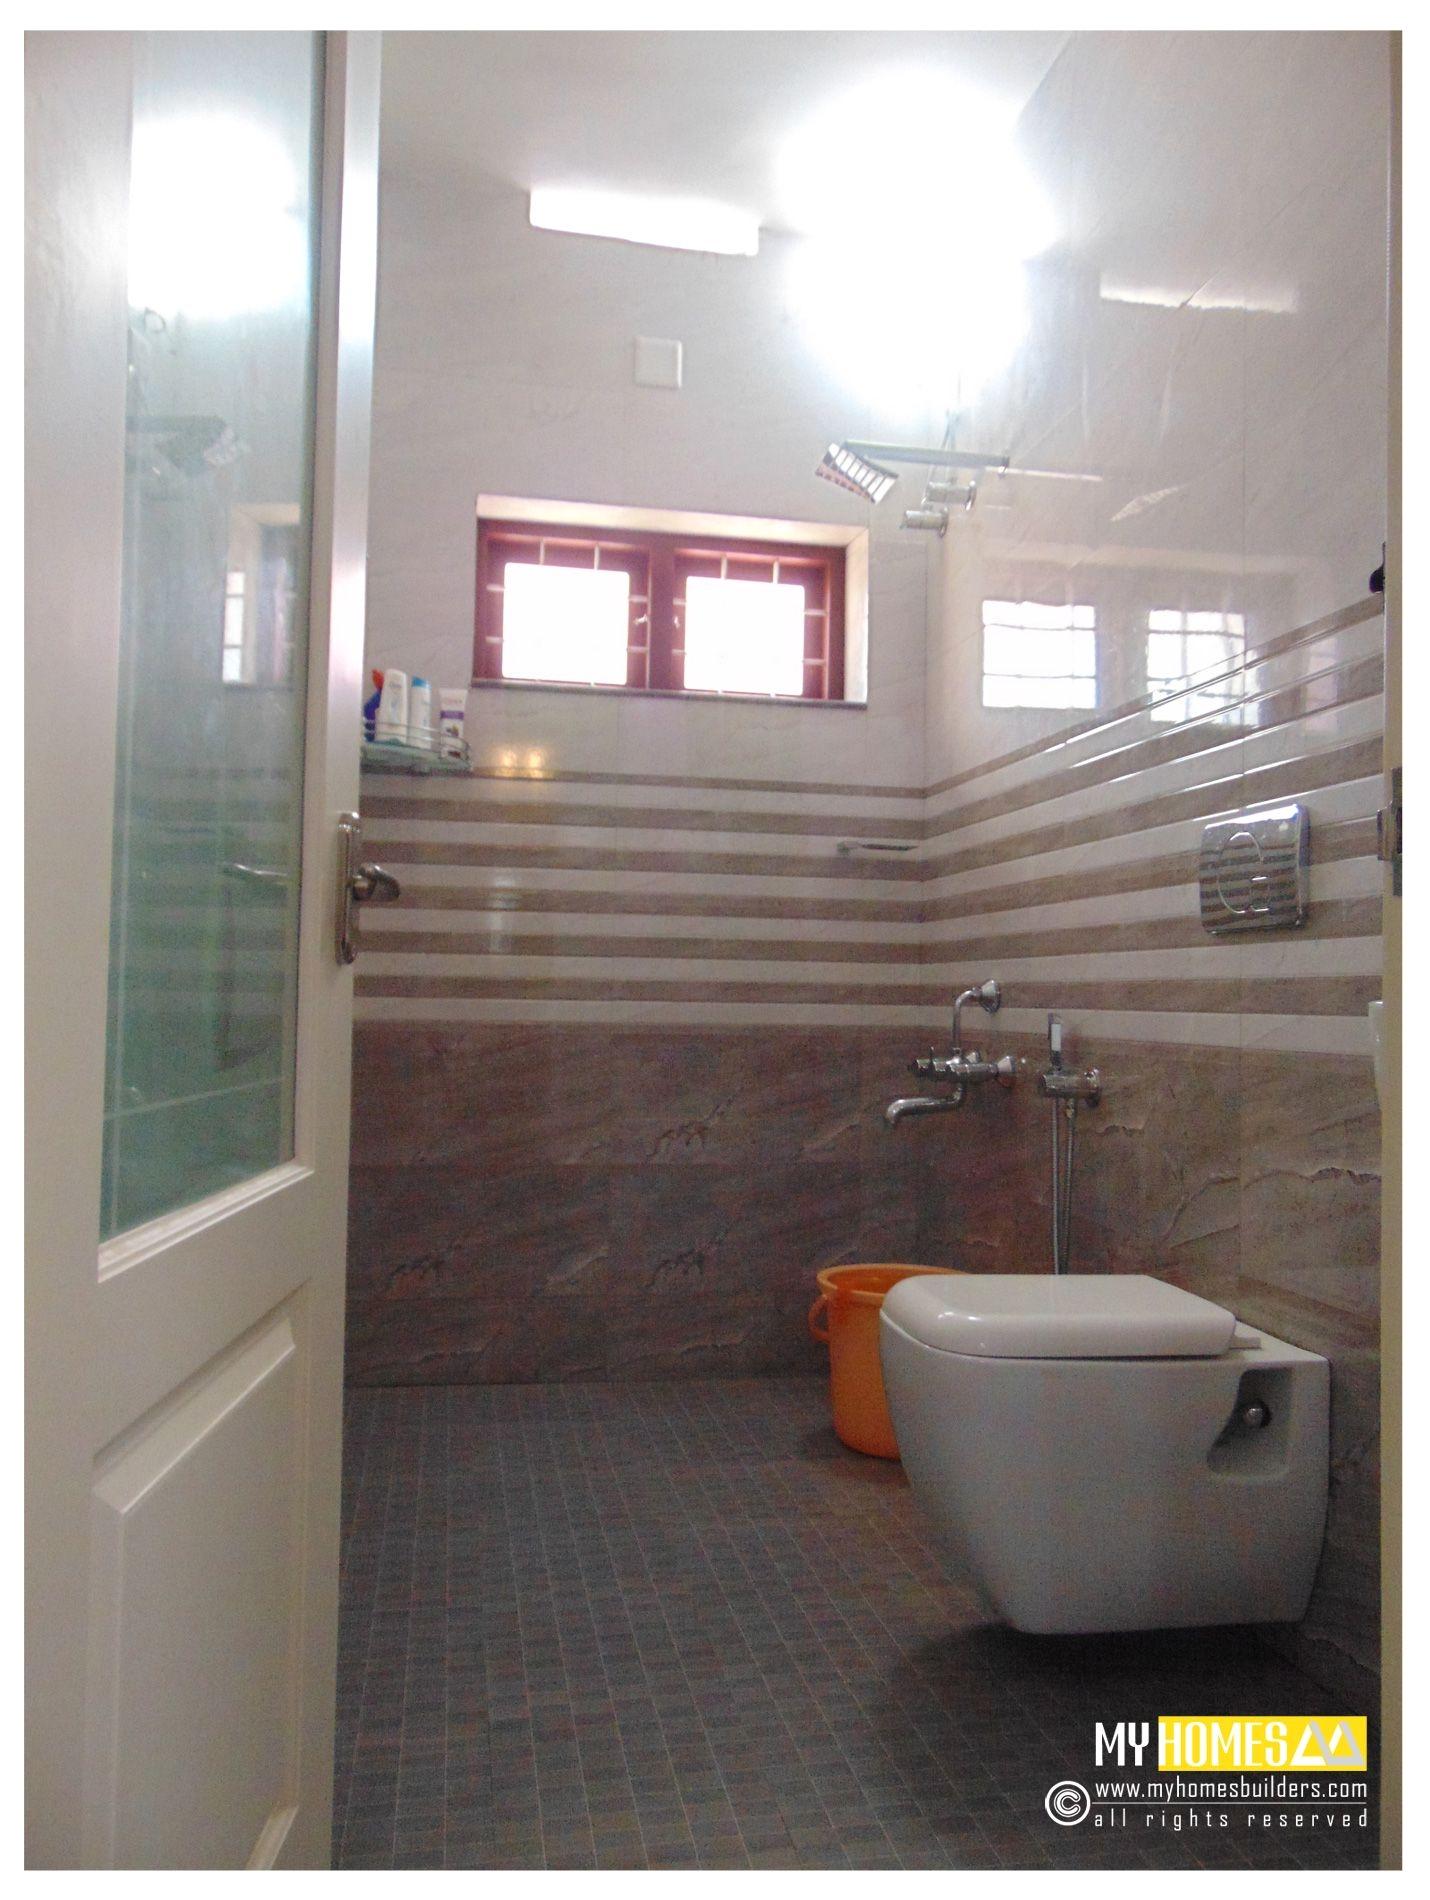 Indian Bathroom Interior Design Ideas Kerala Homes Bathroom Designs top Bathroom Interior Designs In